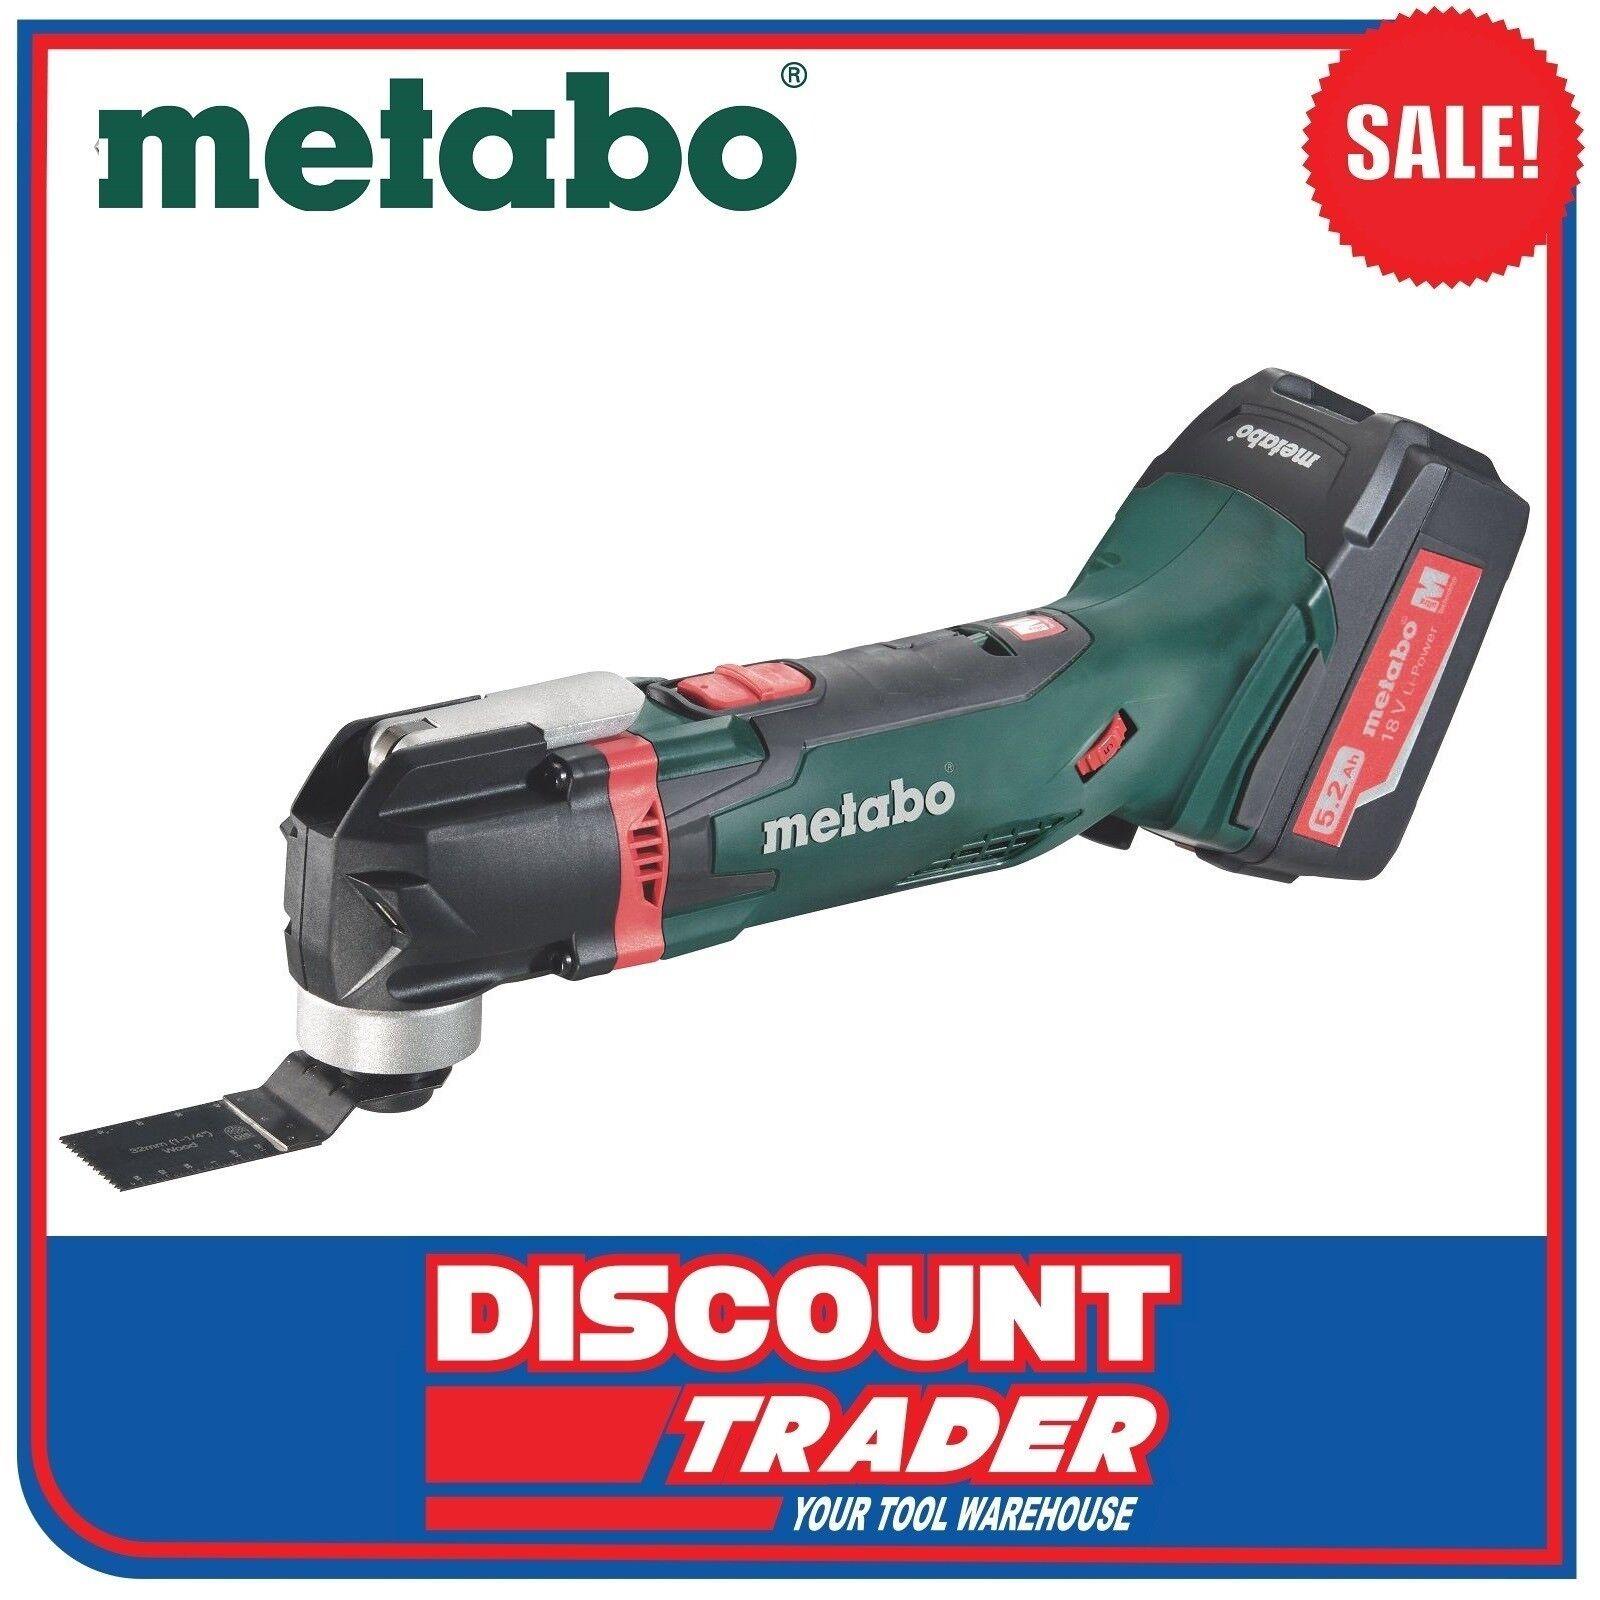 metabo 18v 5.2ah cordless multi-tool kit quick change mt 18 ltx-k